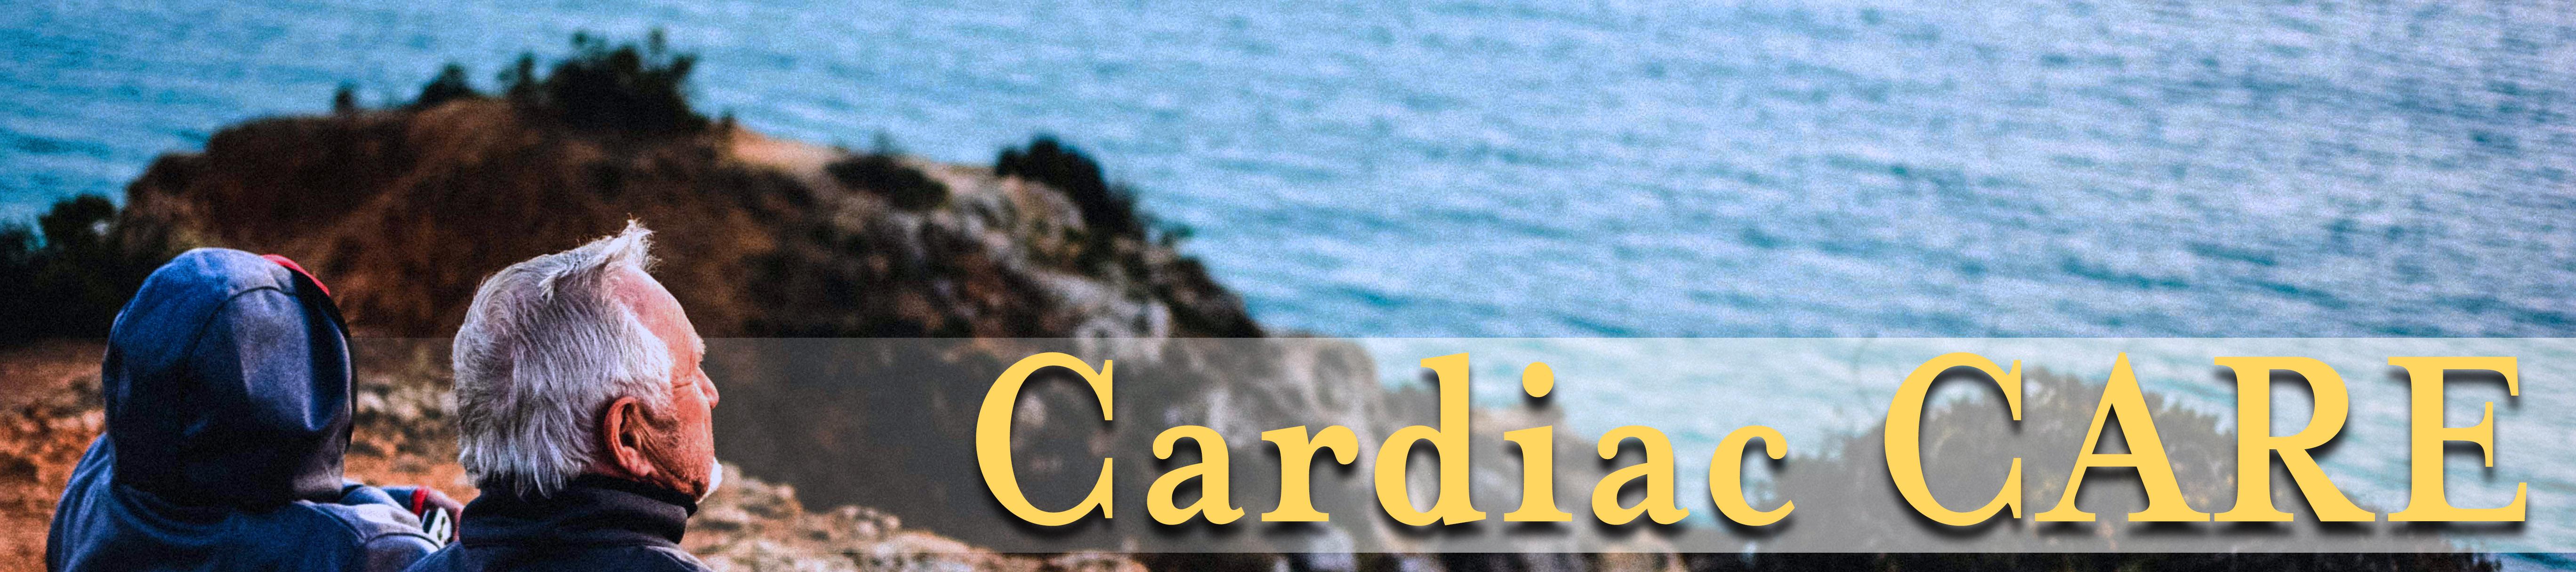 Cardiac-Header